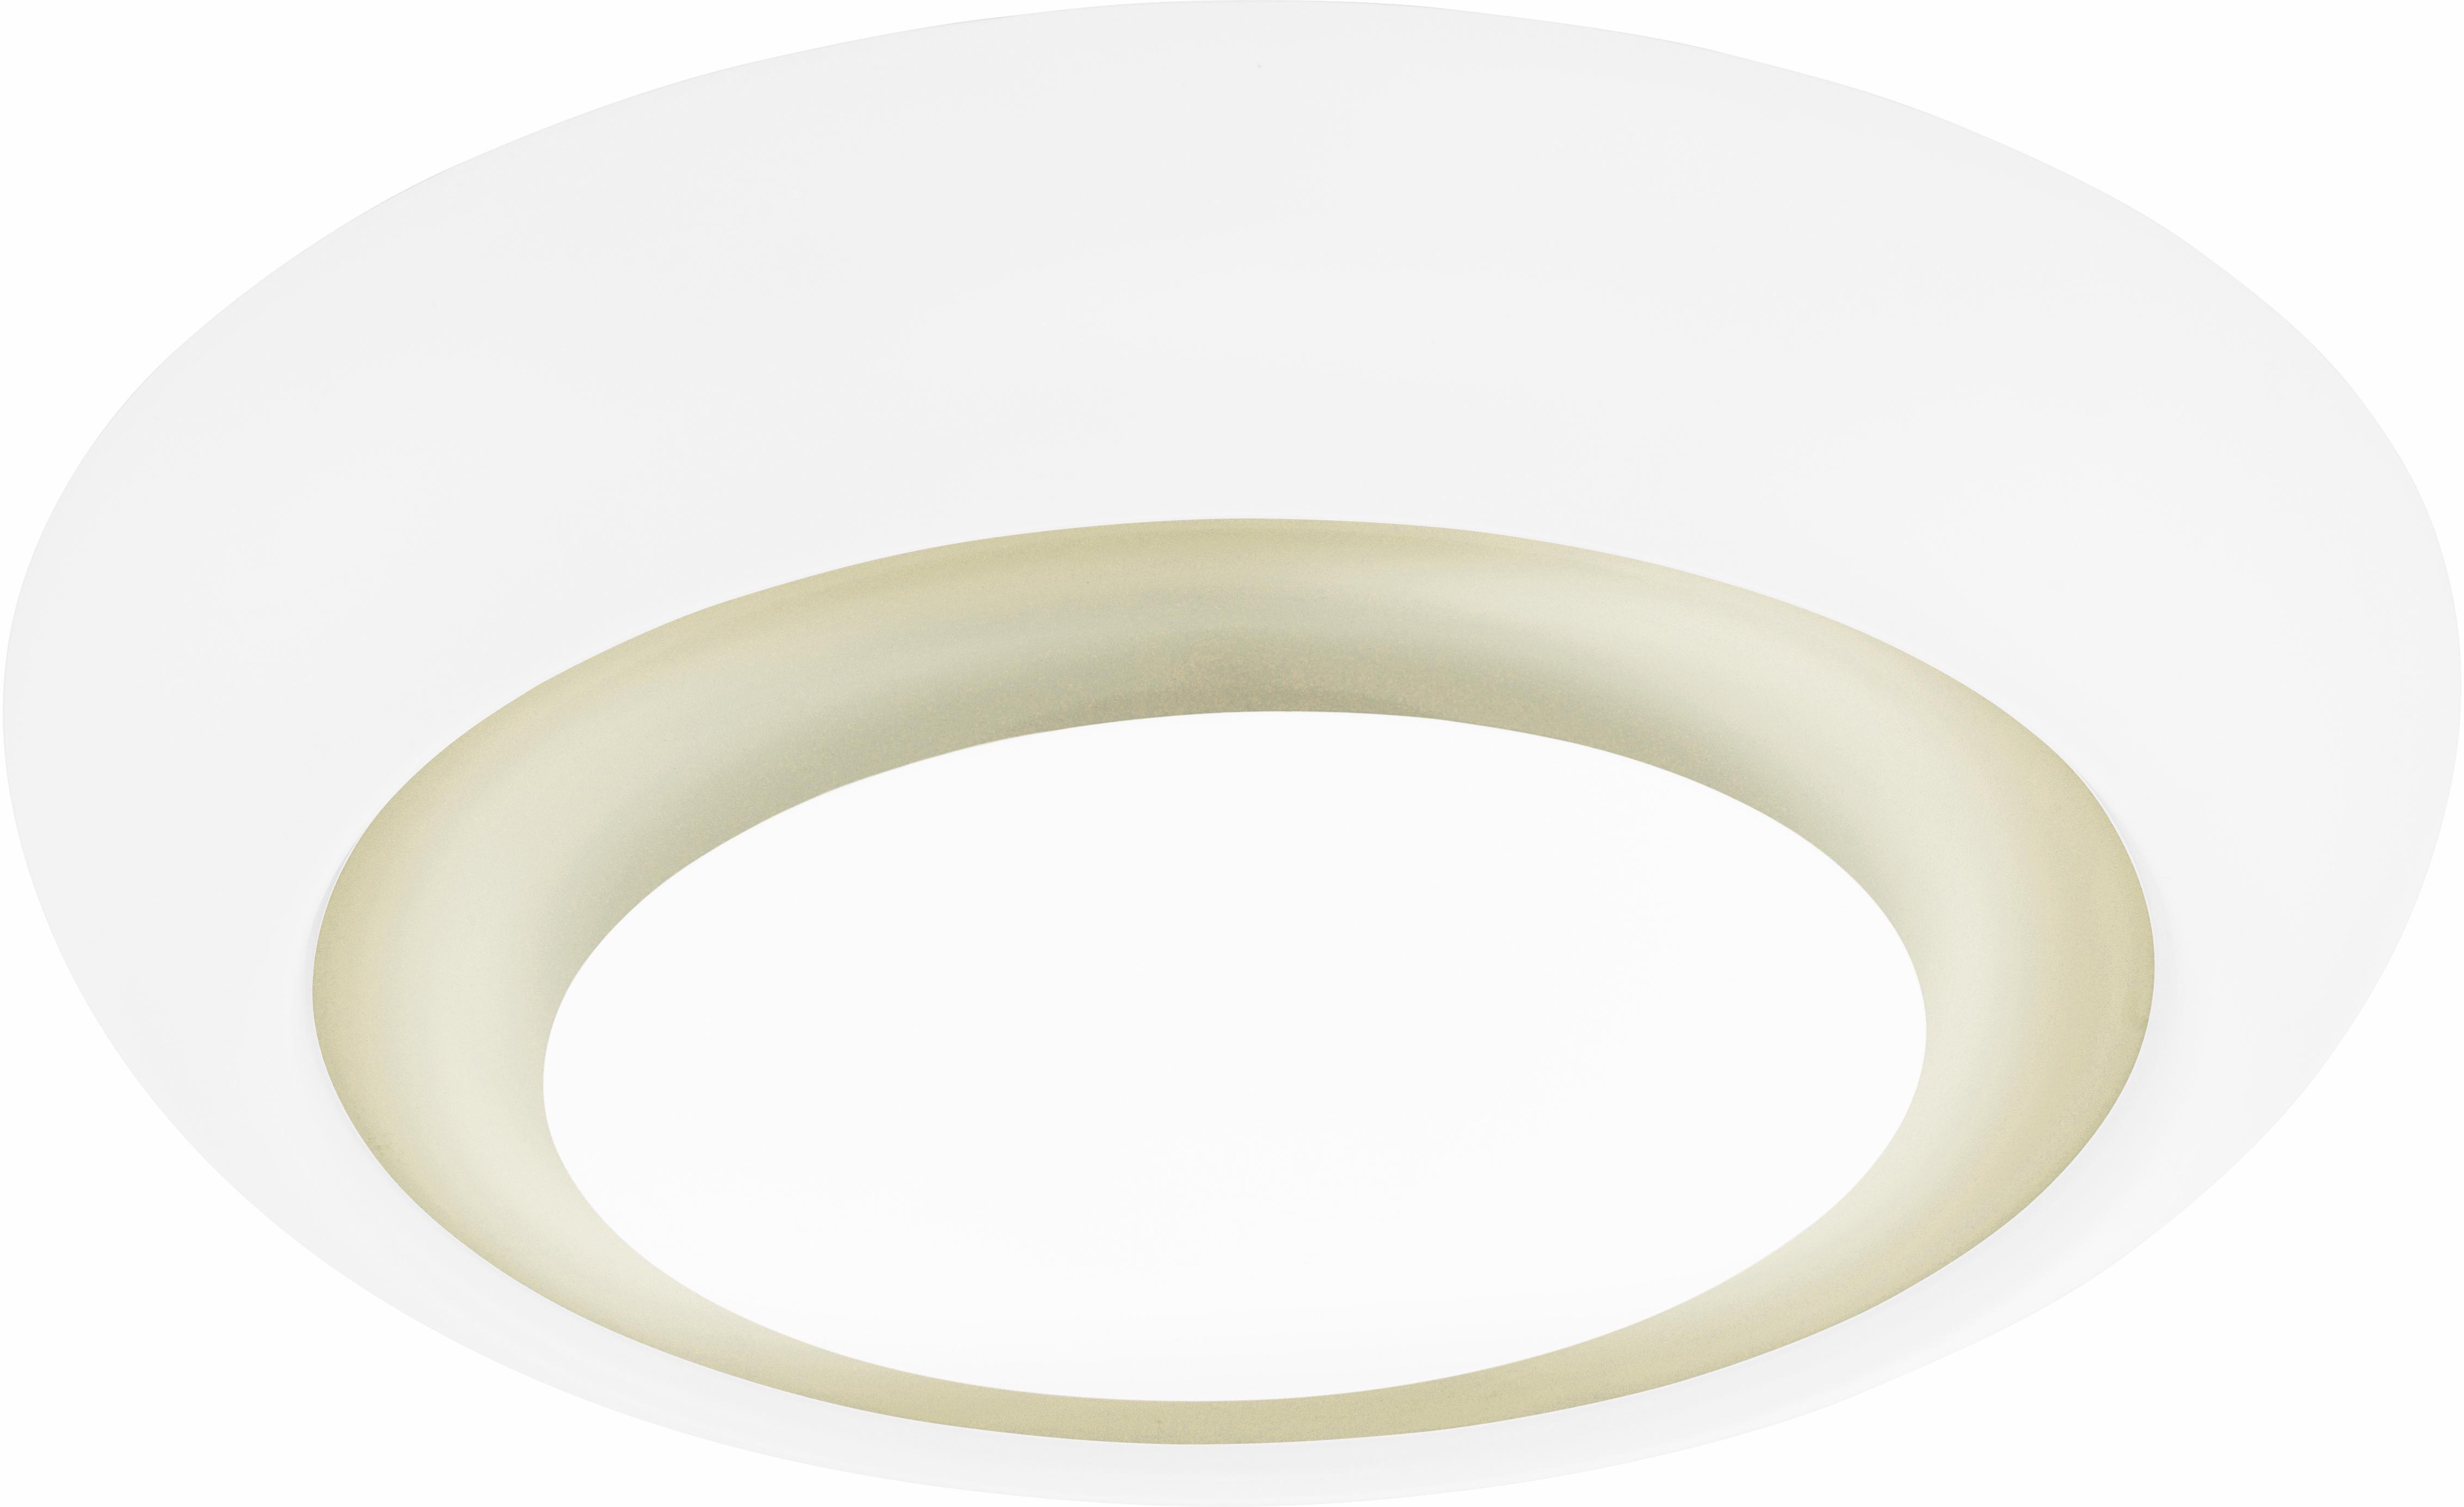 EGLO,LED Deckenleuchte CANUMA